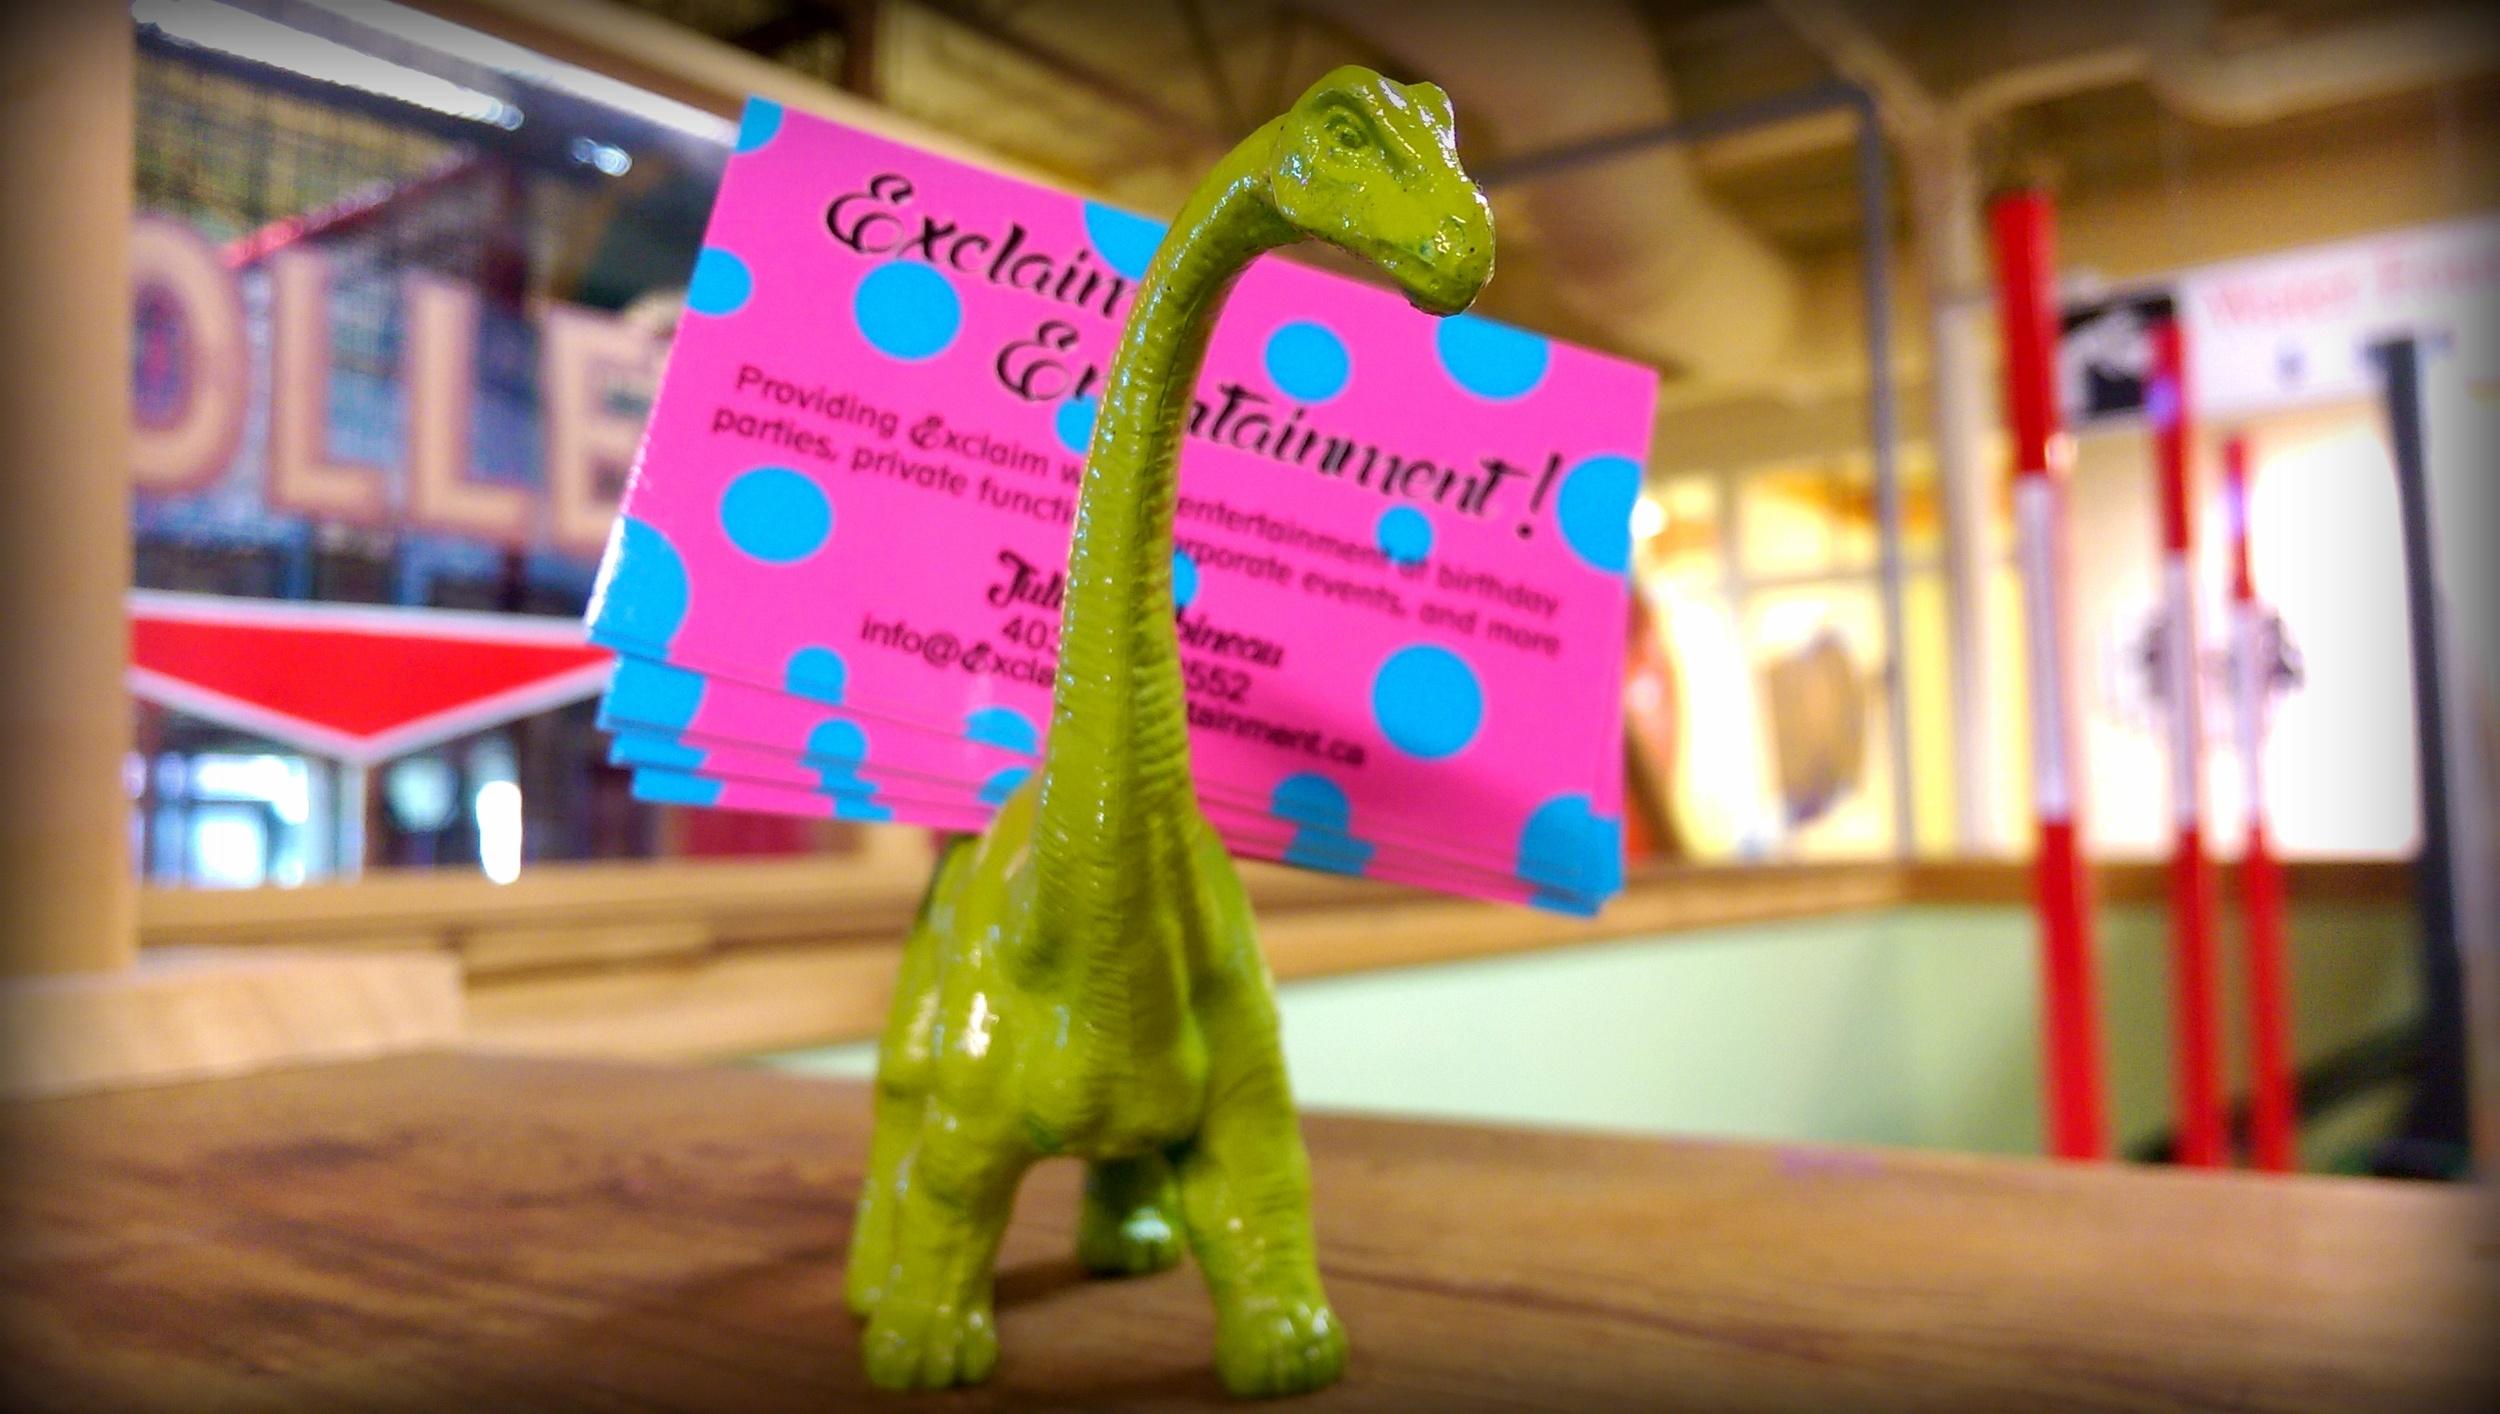 Exclaim Entertainment dinosaur card holder